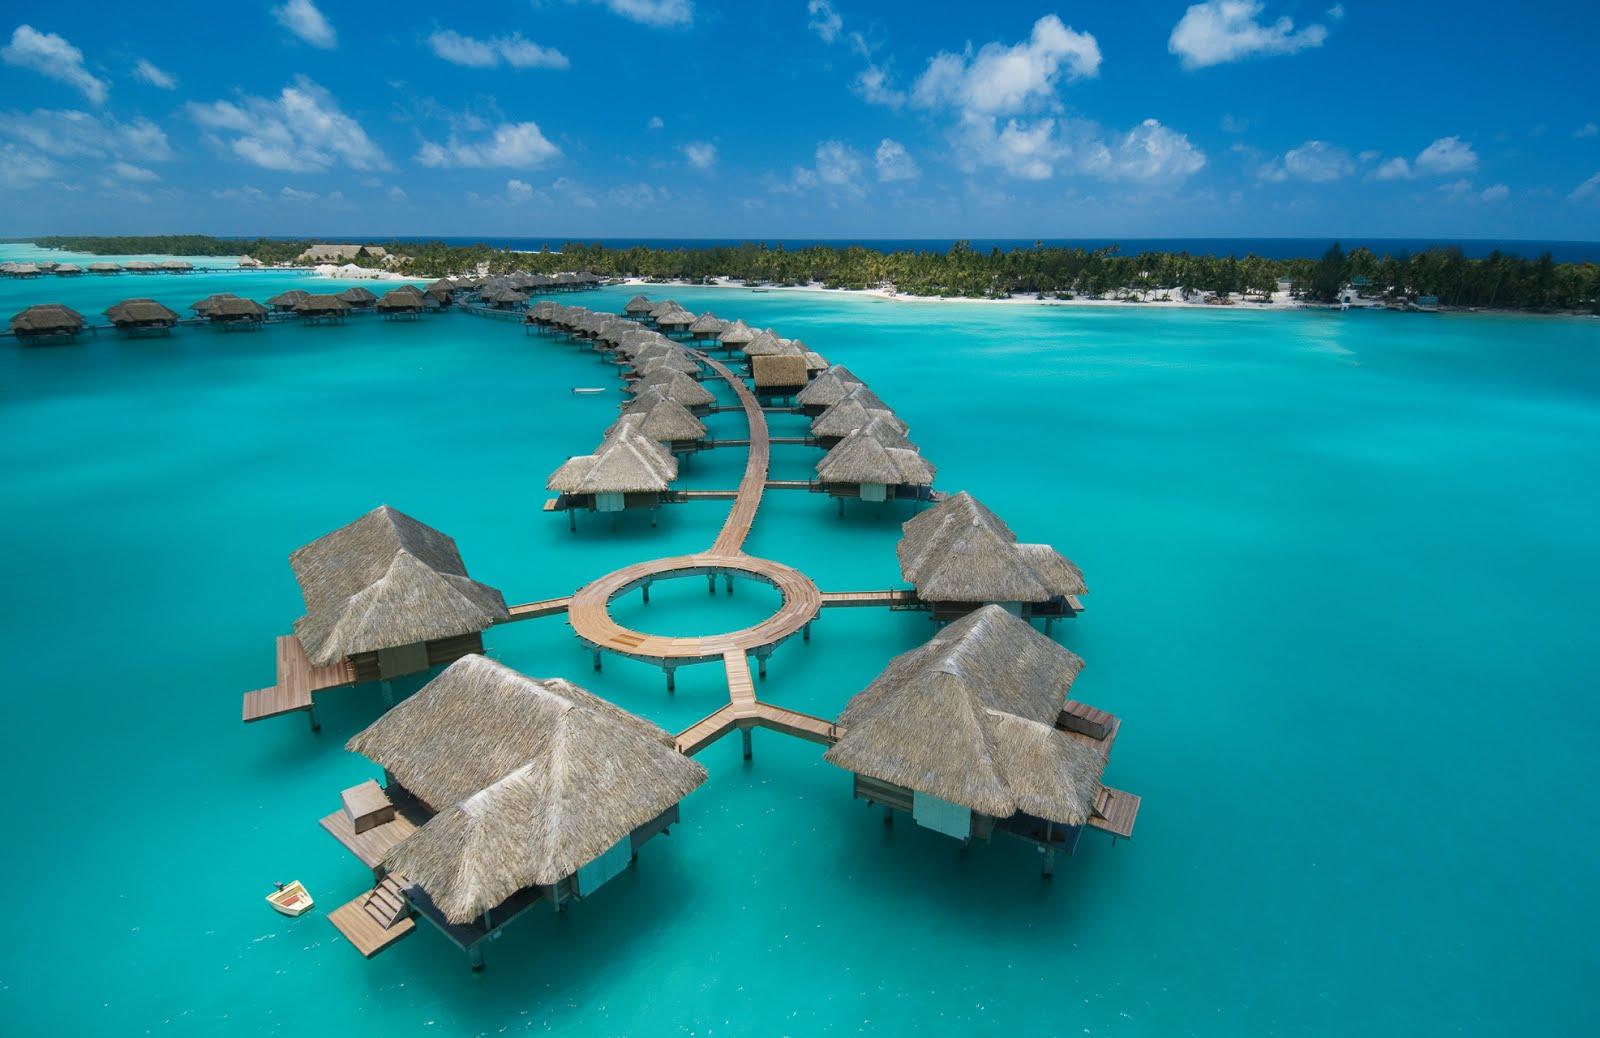 French Polynesia Tahiti Moorea Bora Bora Luxury Resorts